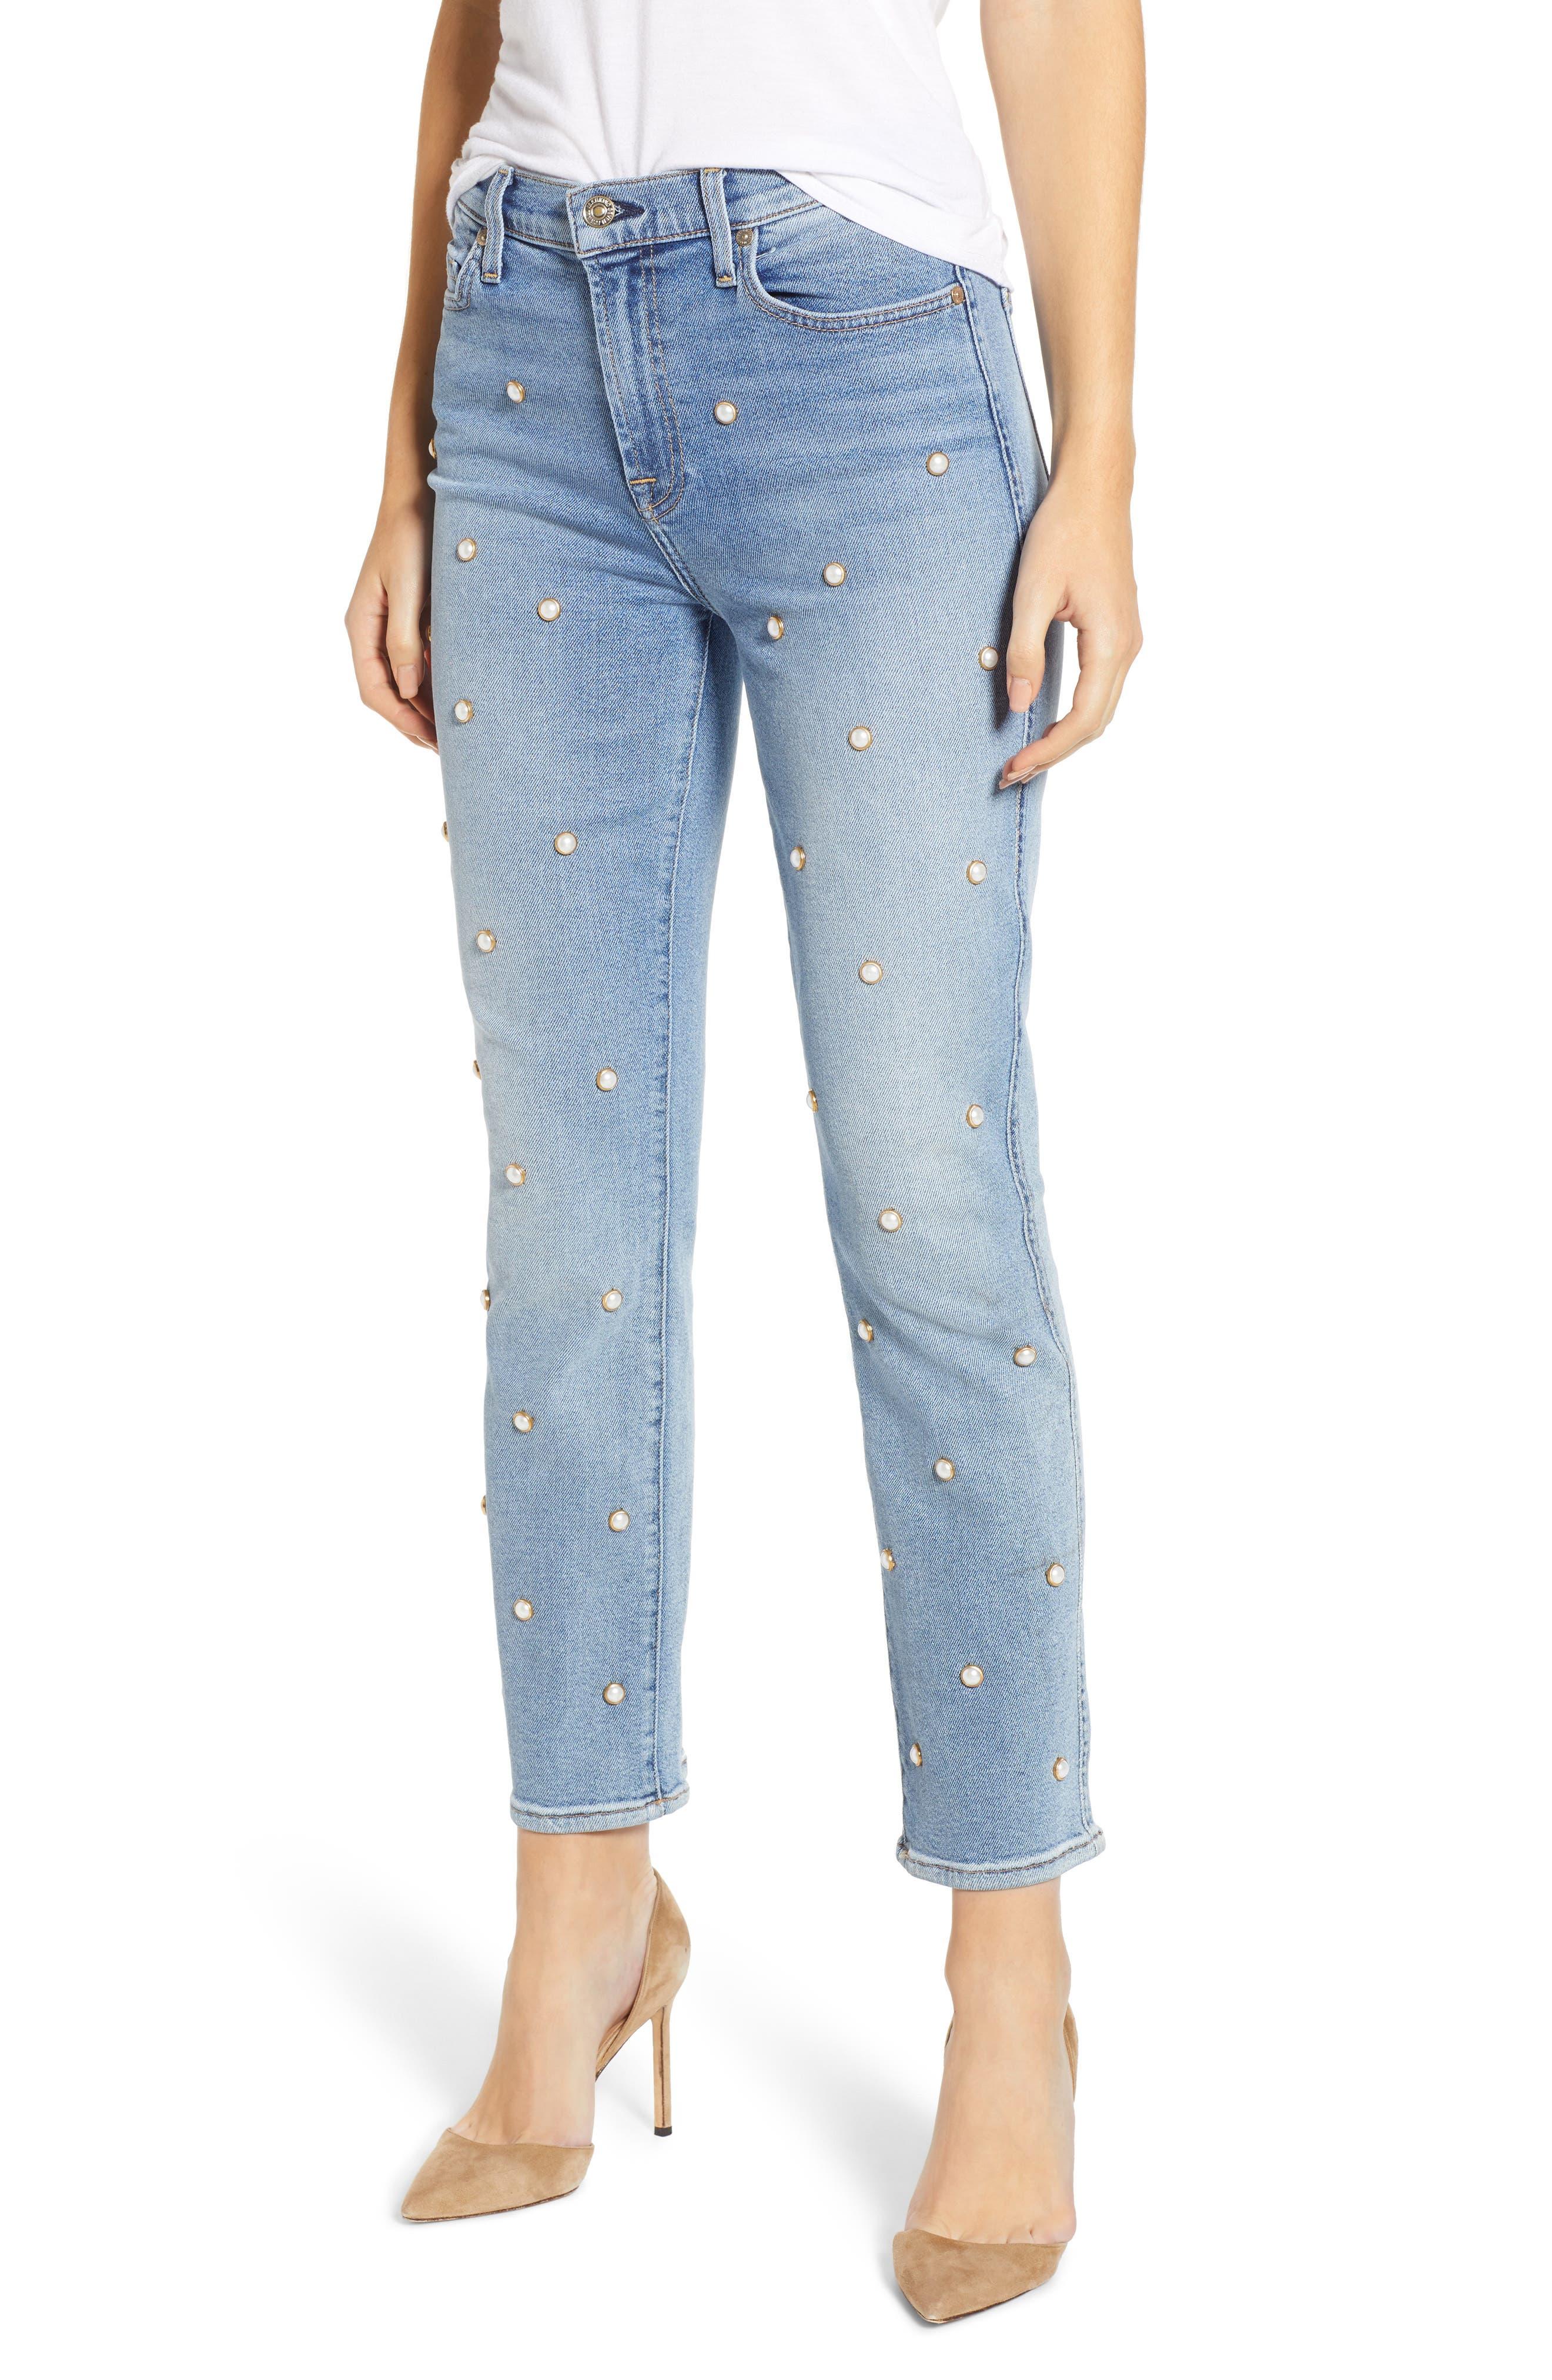 Edie Faux Pearl Detail Ankle Jeans,                             Main thumbnail 1, color,                             LUXE VINTAGE FLORA